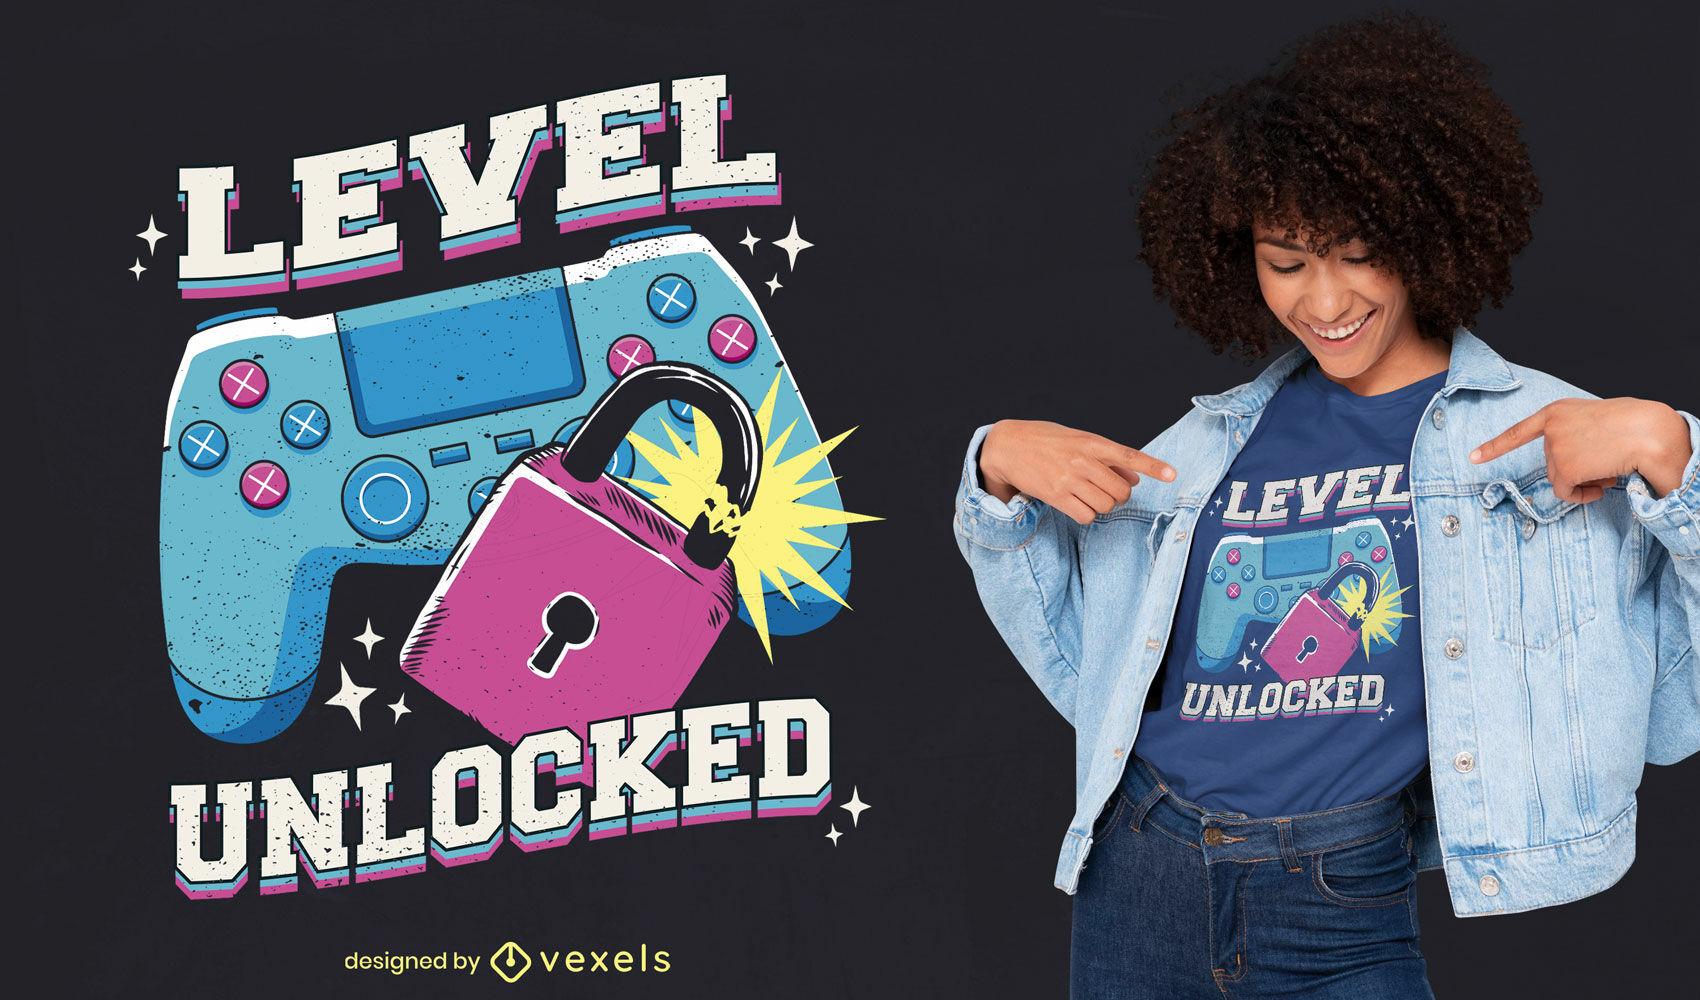 Retro joystick gamer t-shirt design